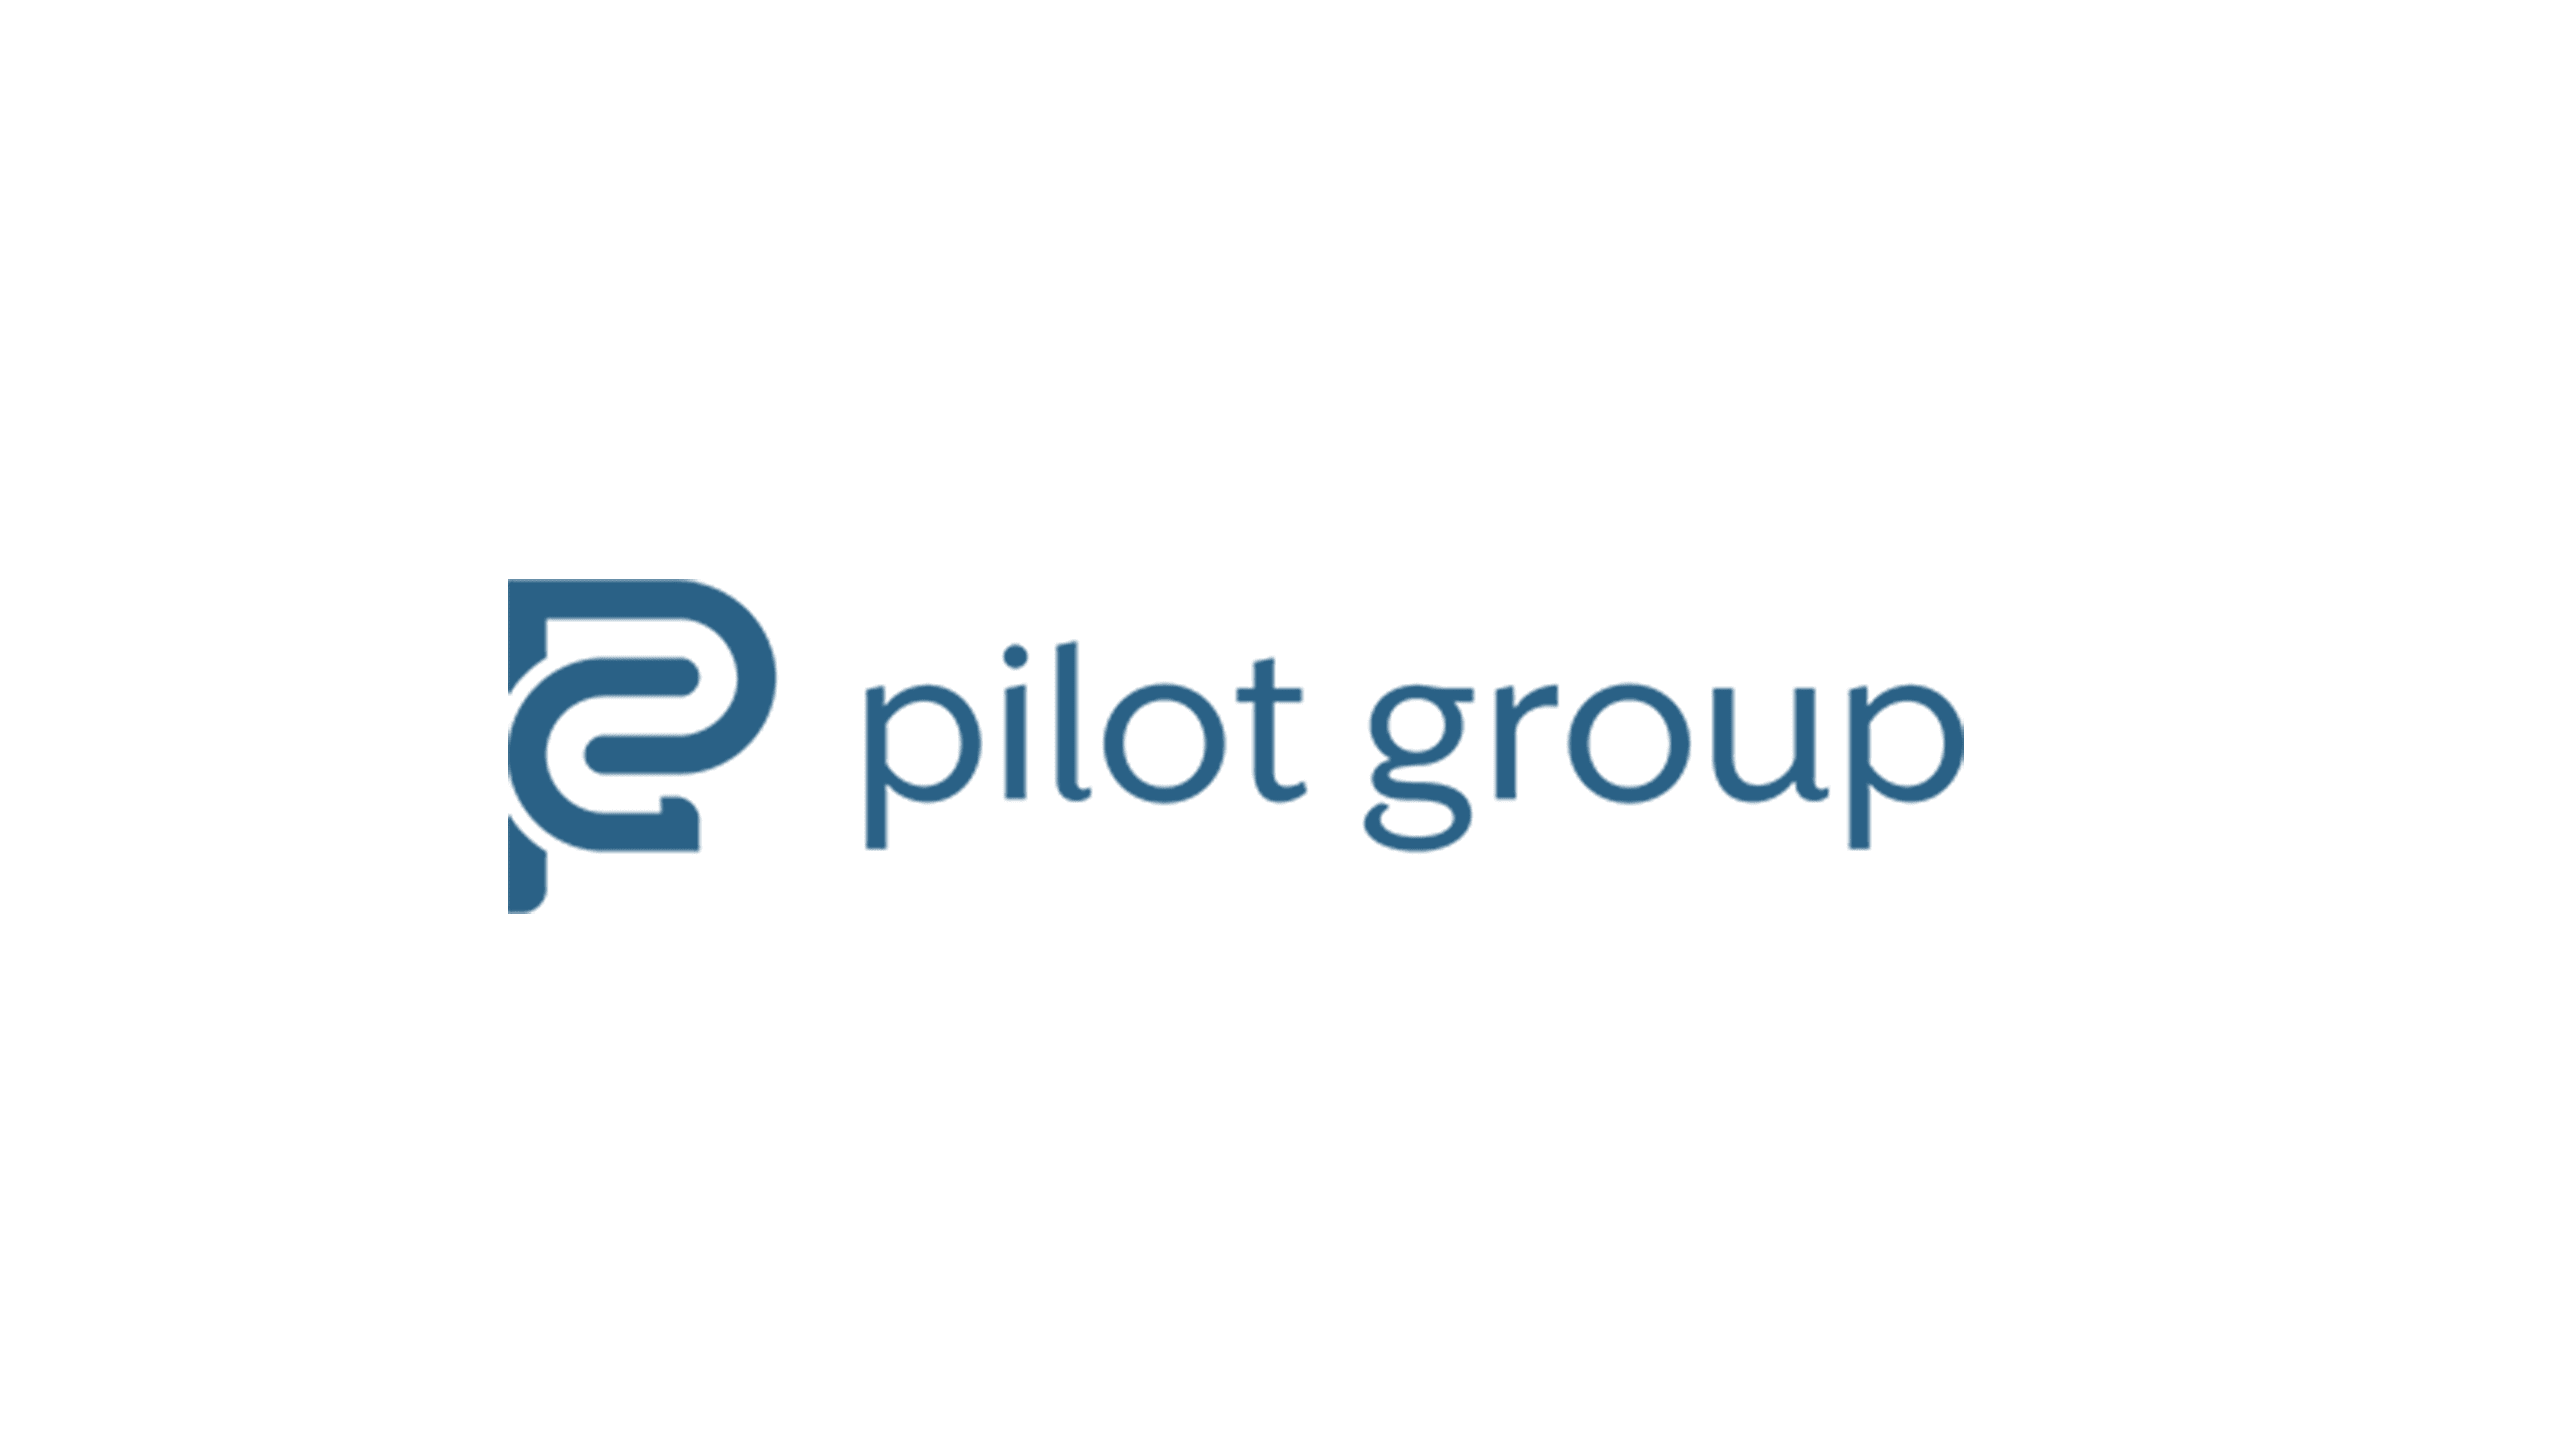 Pilot Group Infrastructure Ltd